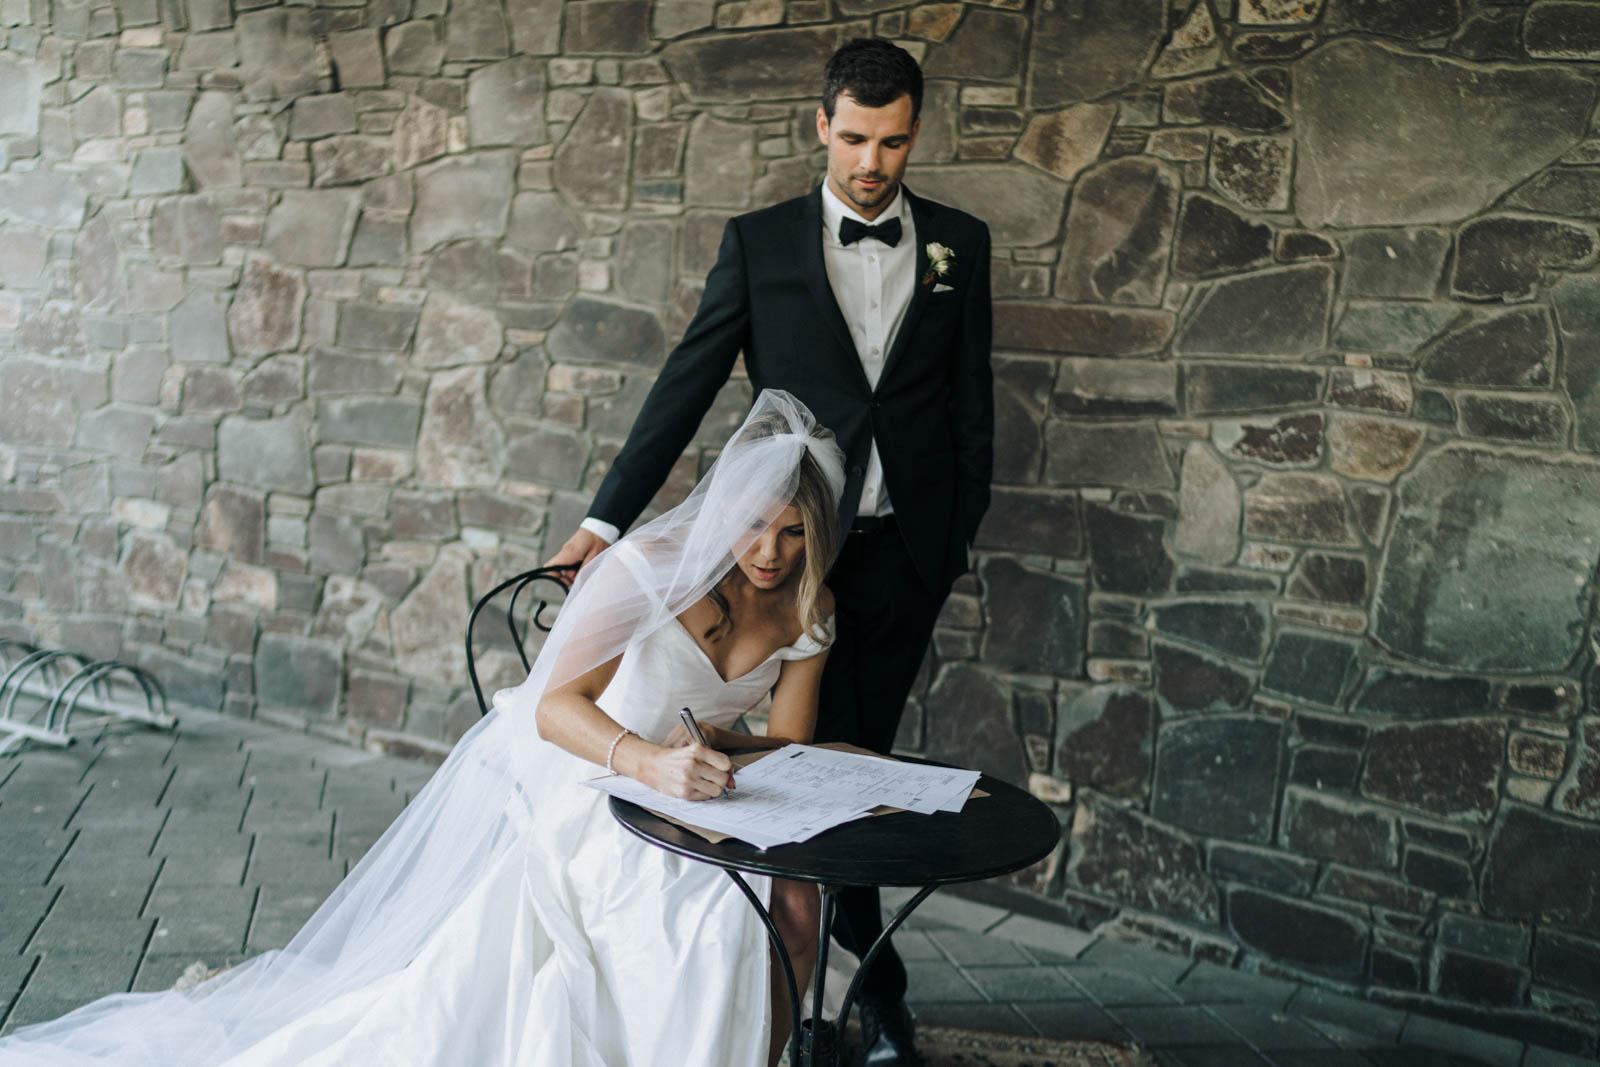 newfound-s-p-mt-maunganui-tauranga-wedding-photographer-1715-A9_06625